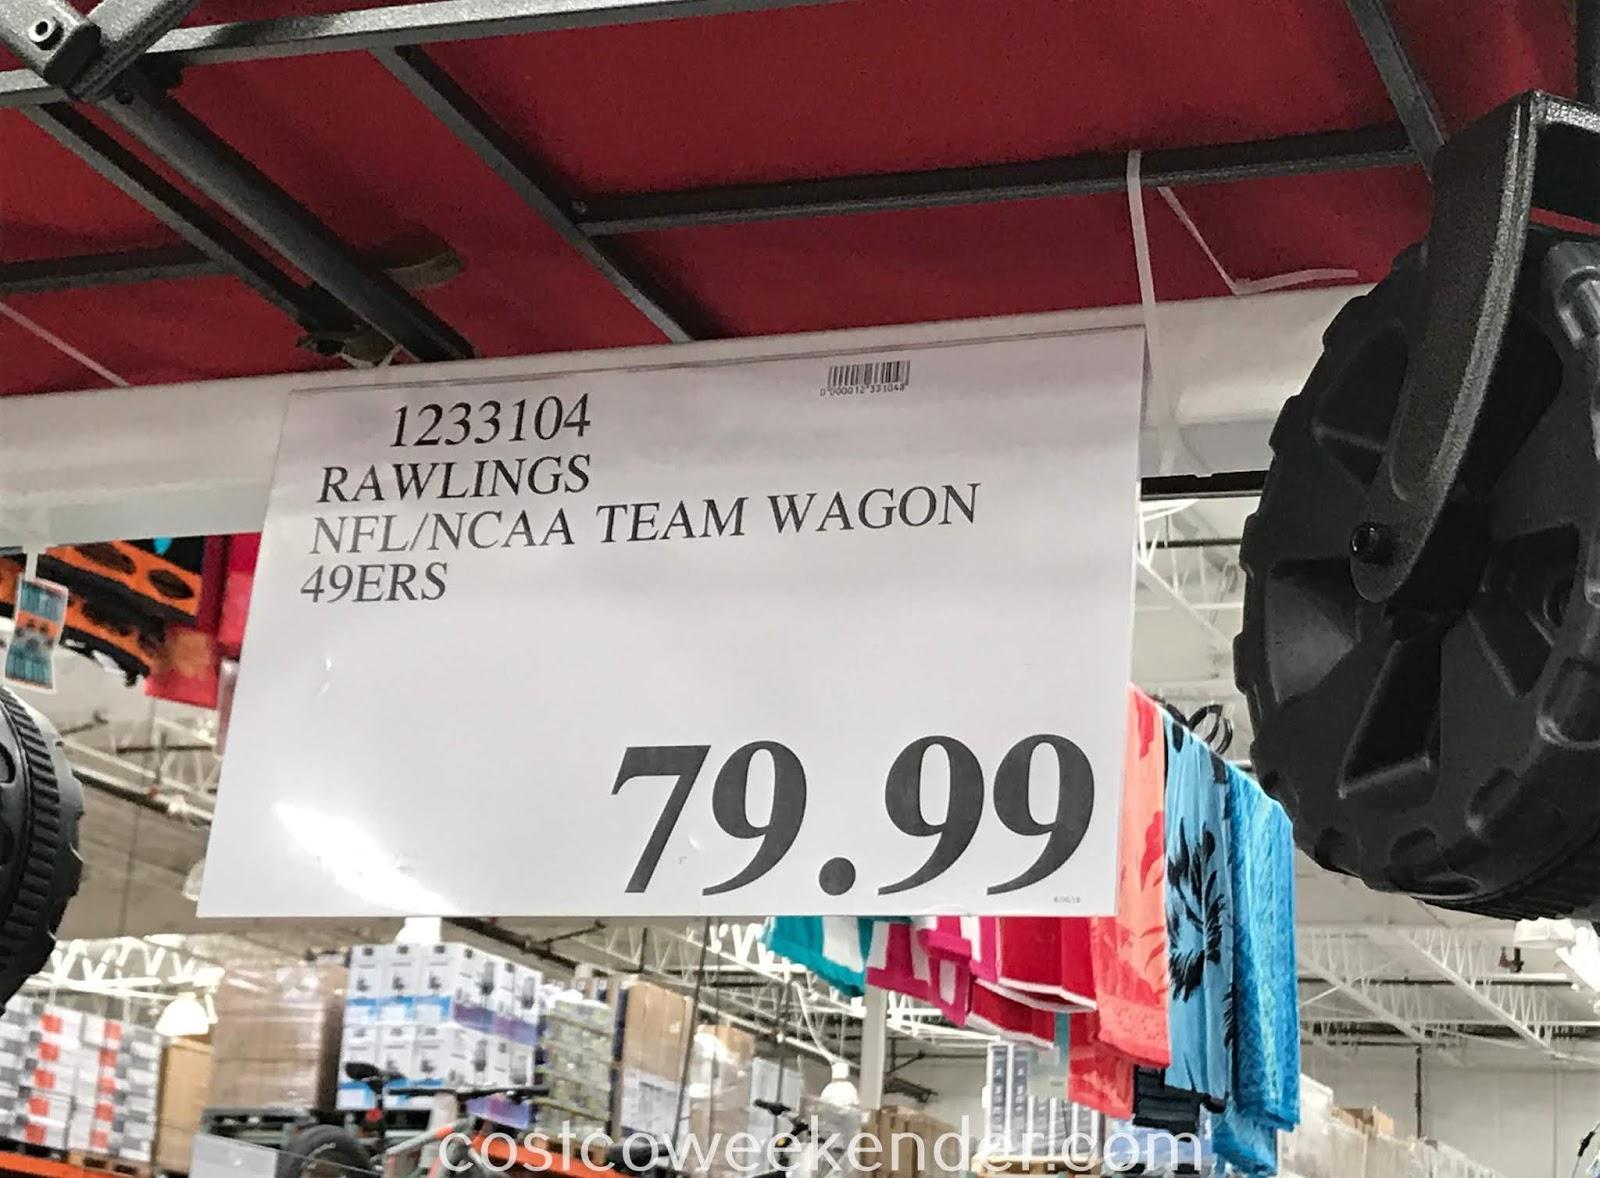 Rawlings NFL/NCAA Tailgate Team Wagon | Costco Weekender